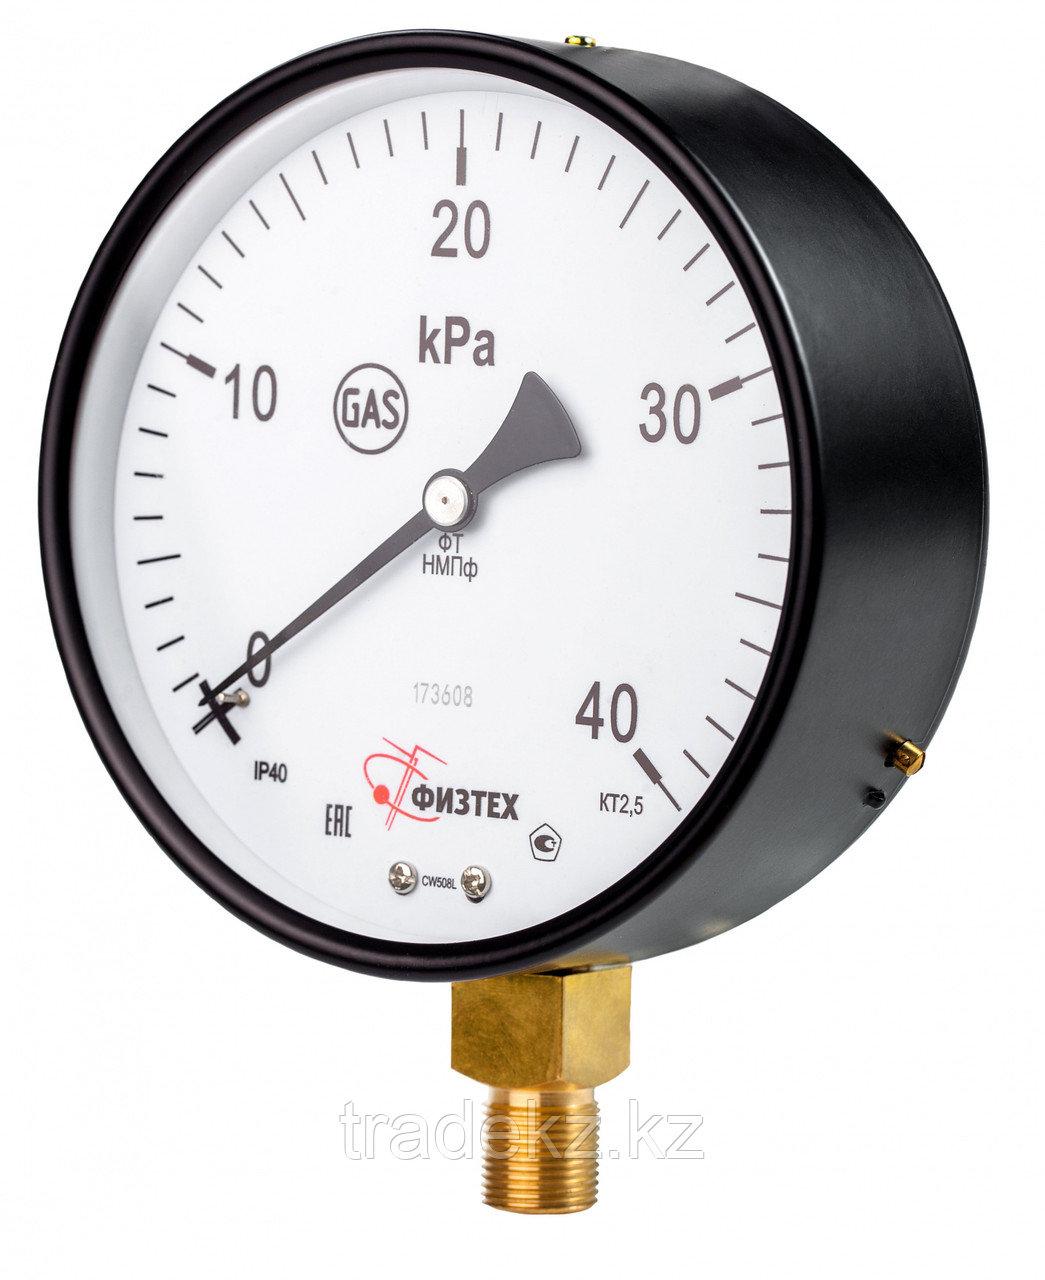 Манометр низкого давления (тягонапоромер, напоромер) мембранный ТНМПф, НМПф IP54 д.150